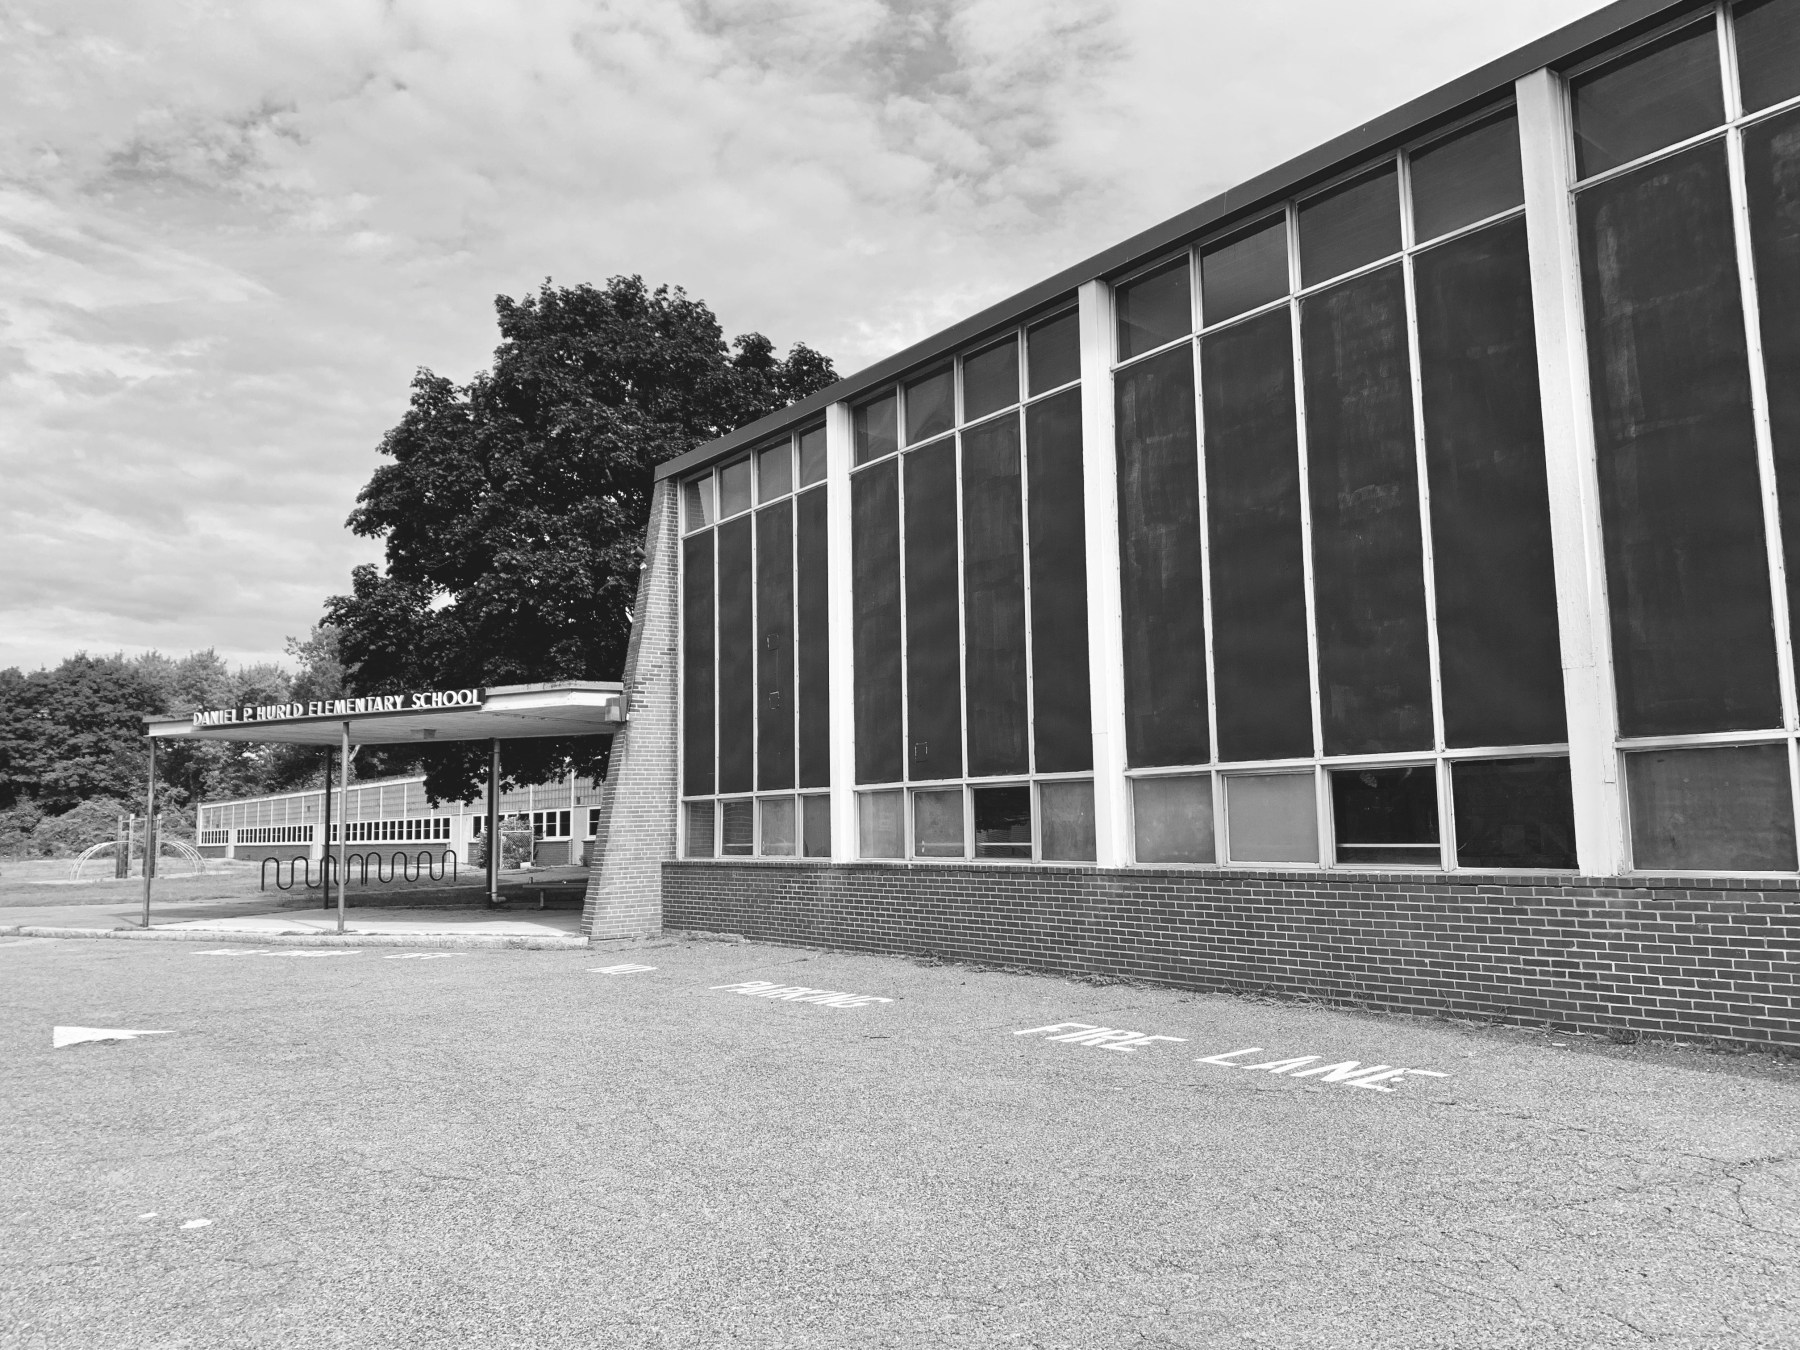 Daniel P. Hurld Elementary School 4 Woburn MA